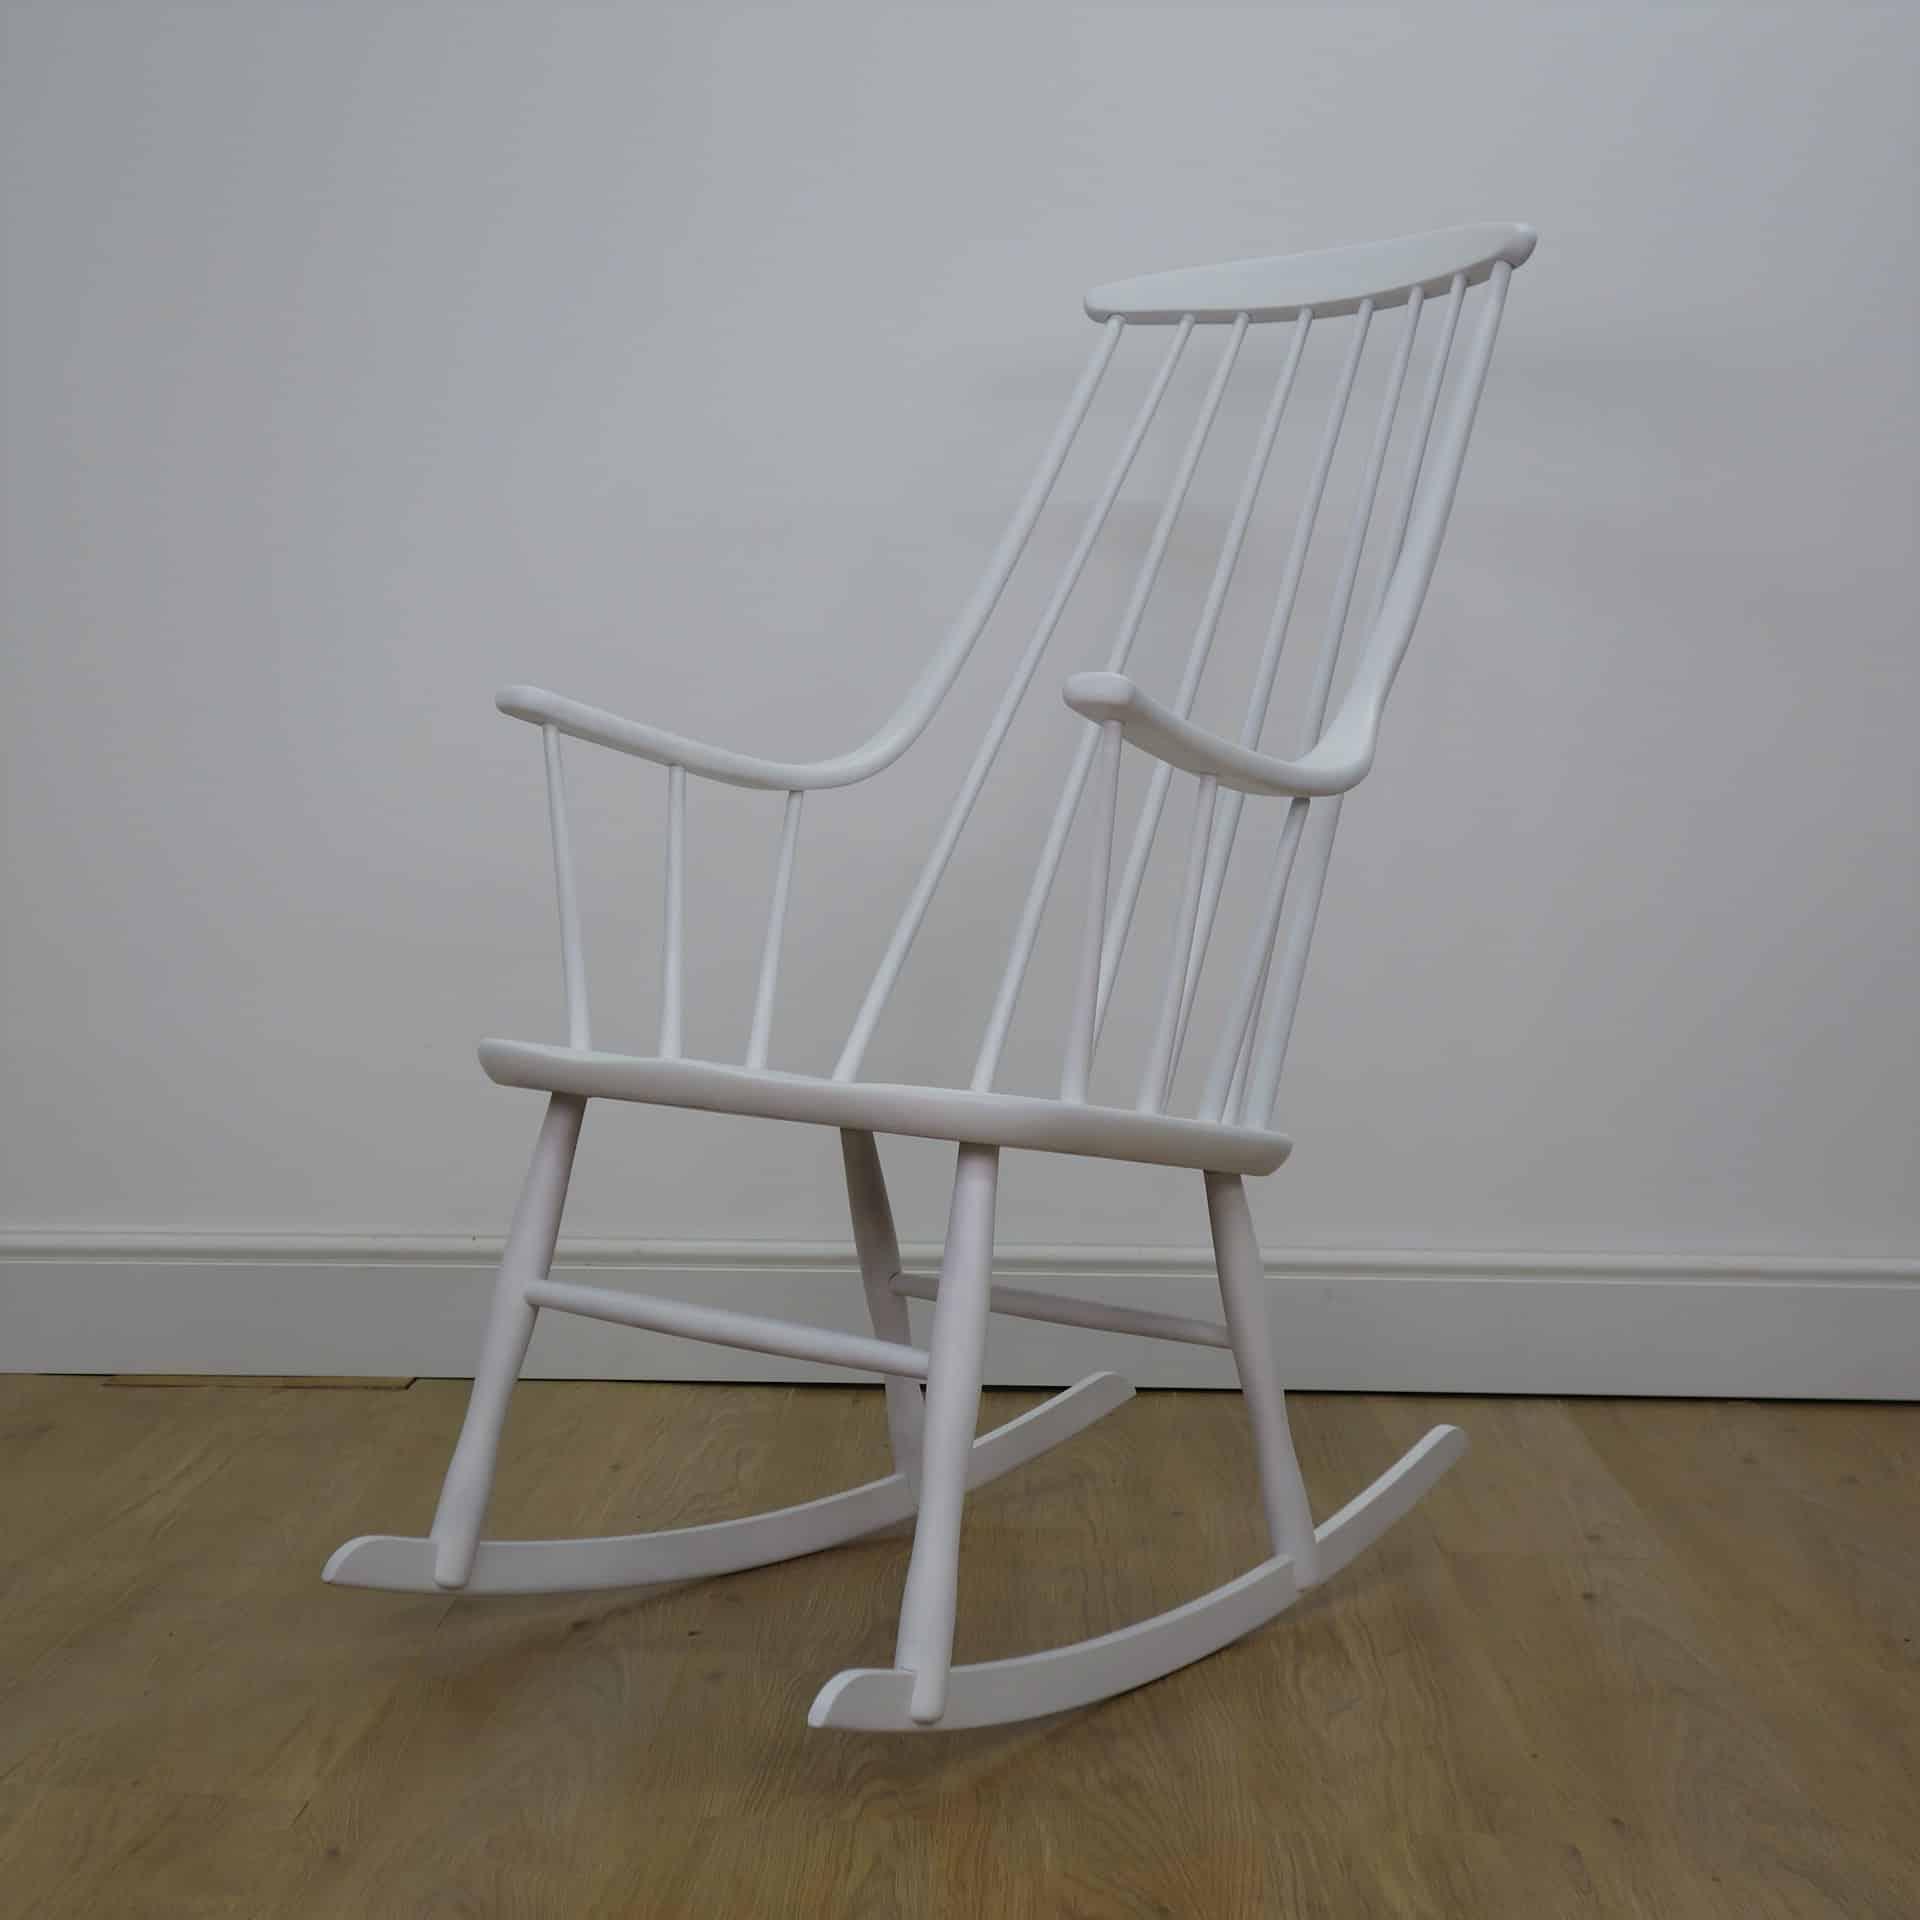 White Grandessa rocking chair by Lena Larsson